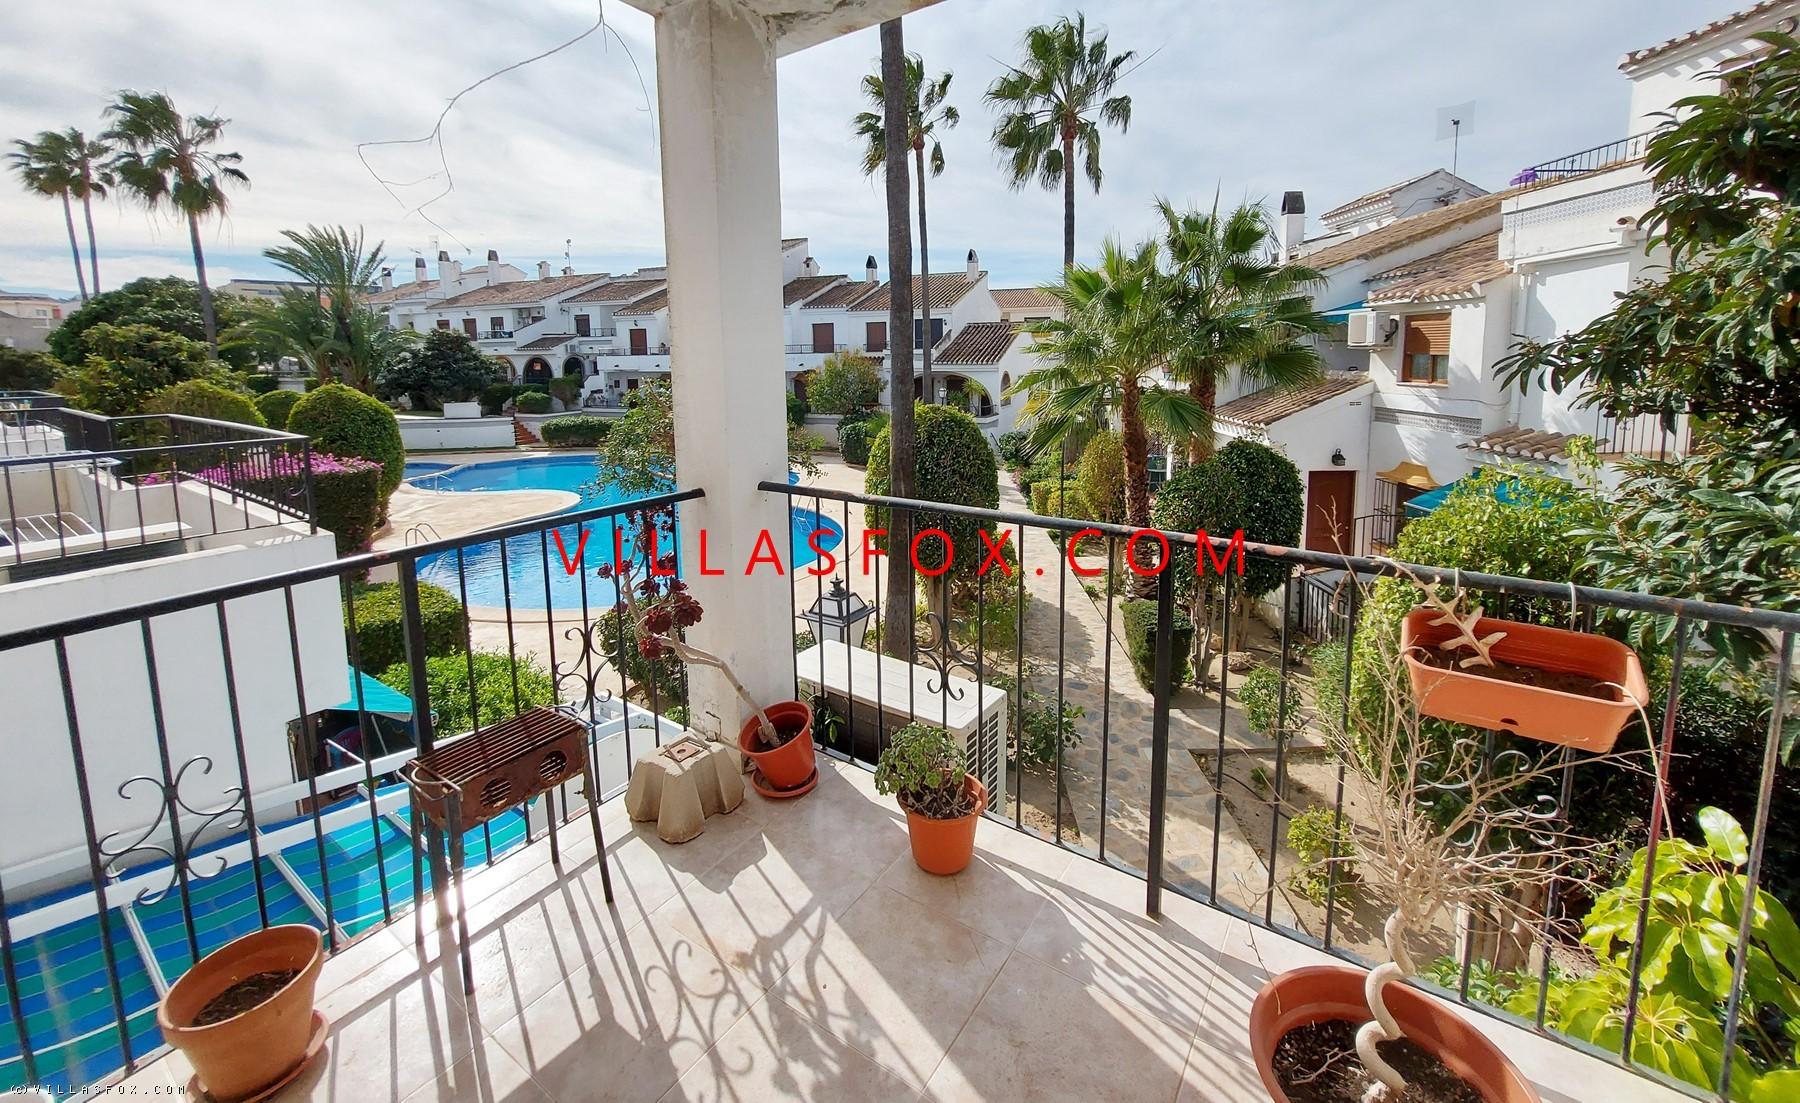 San Miguel de Salinas south-facing first-floor 2-bedroom apartment with sun terrace